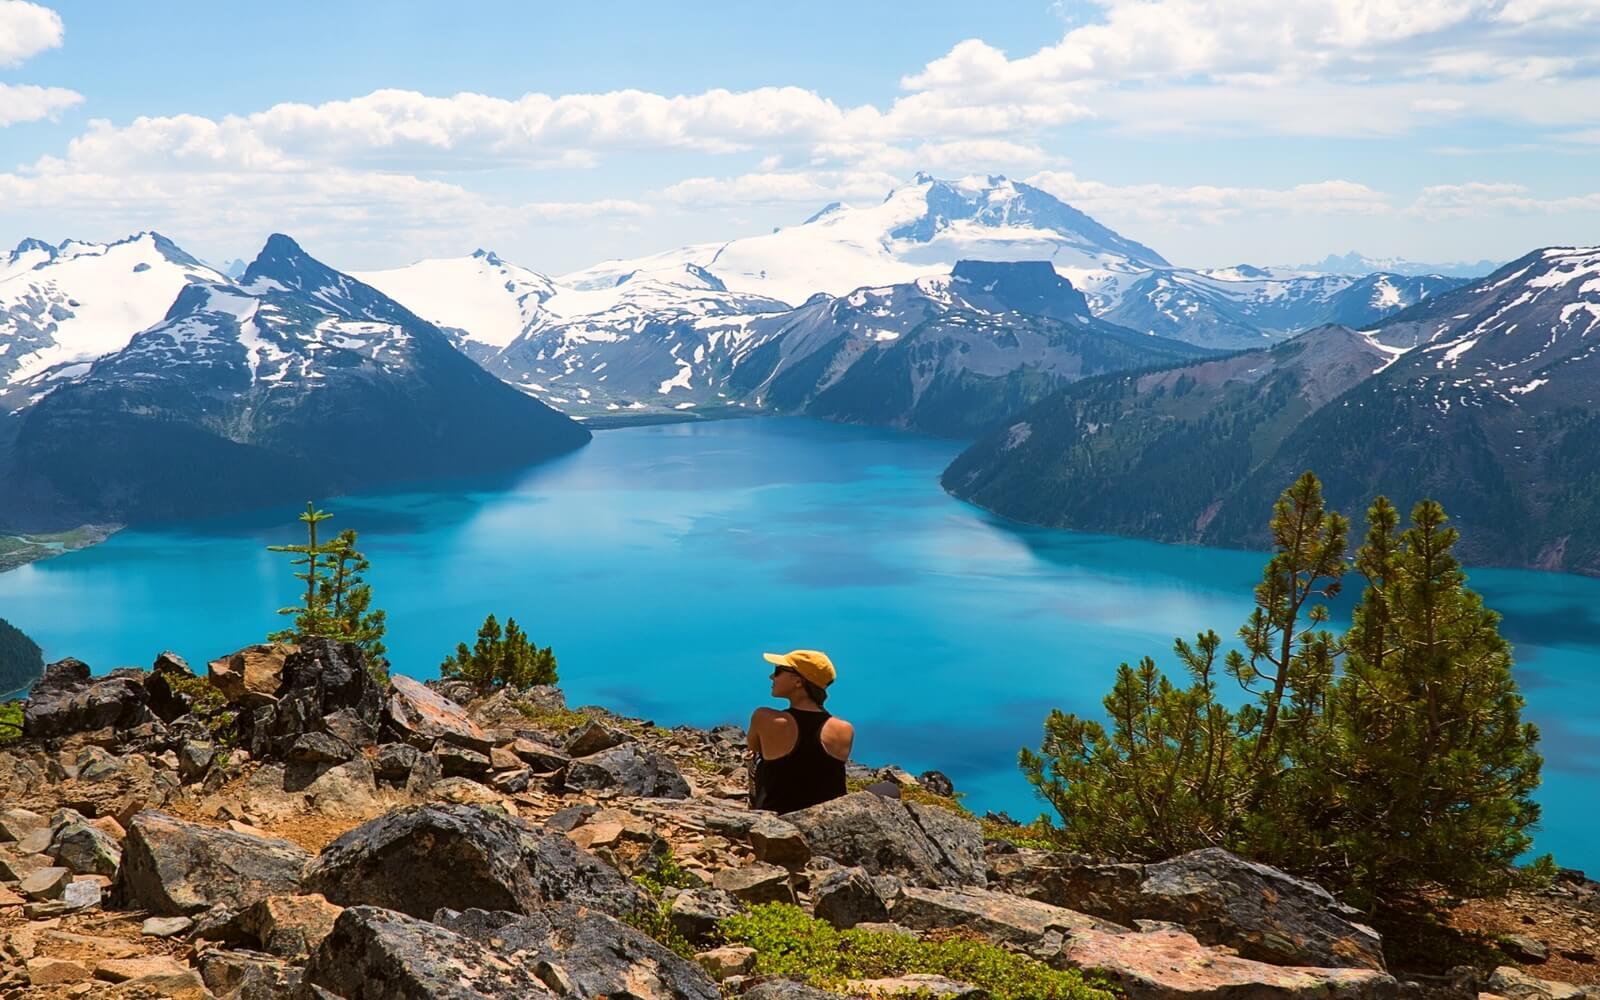 A woman admires the view of Garibaldi Lake